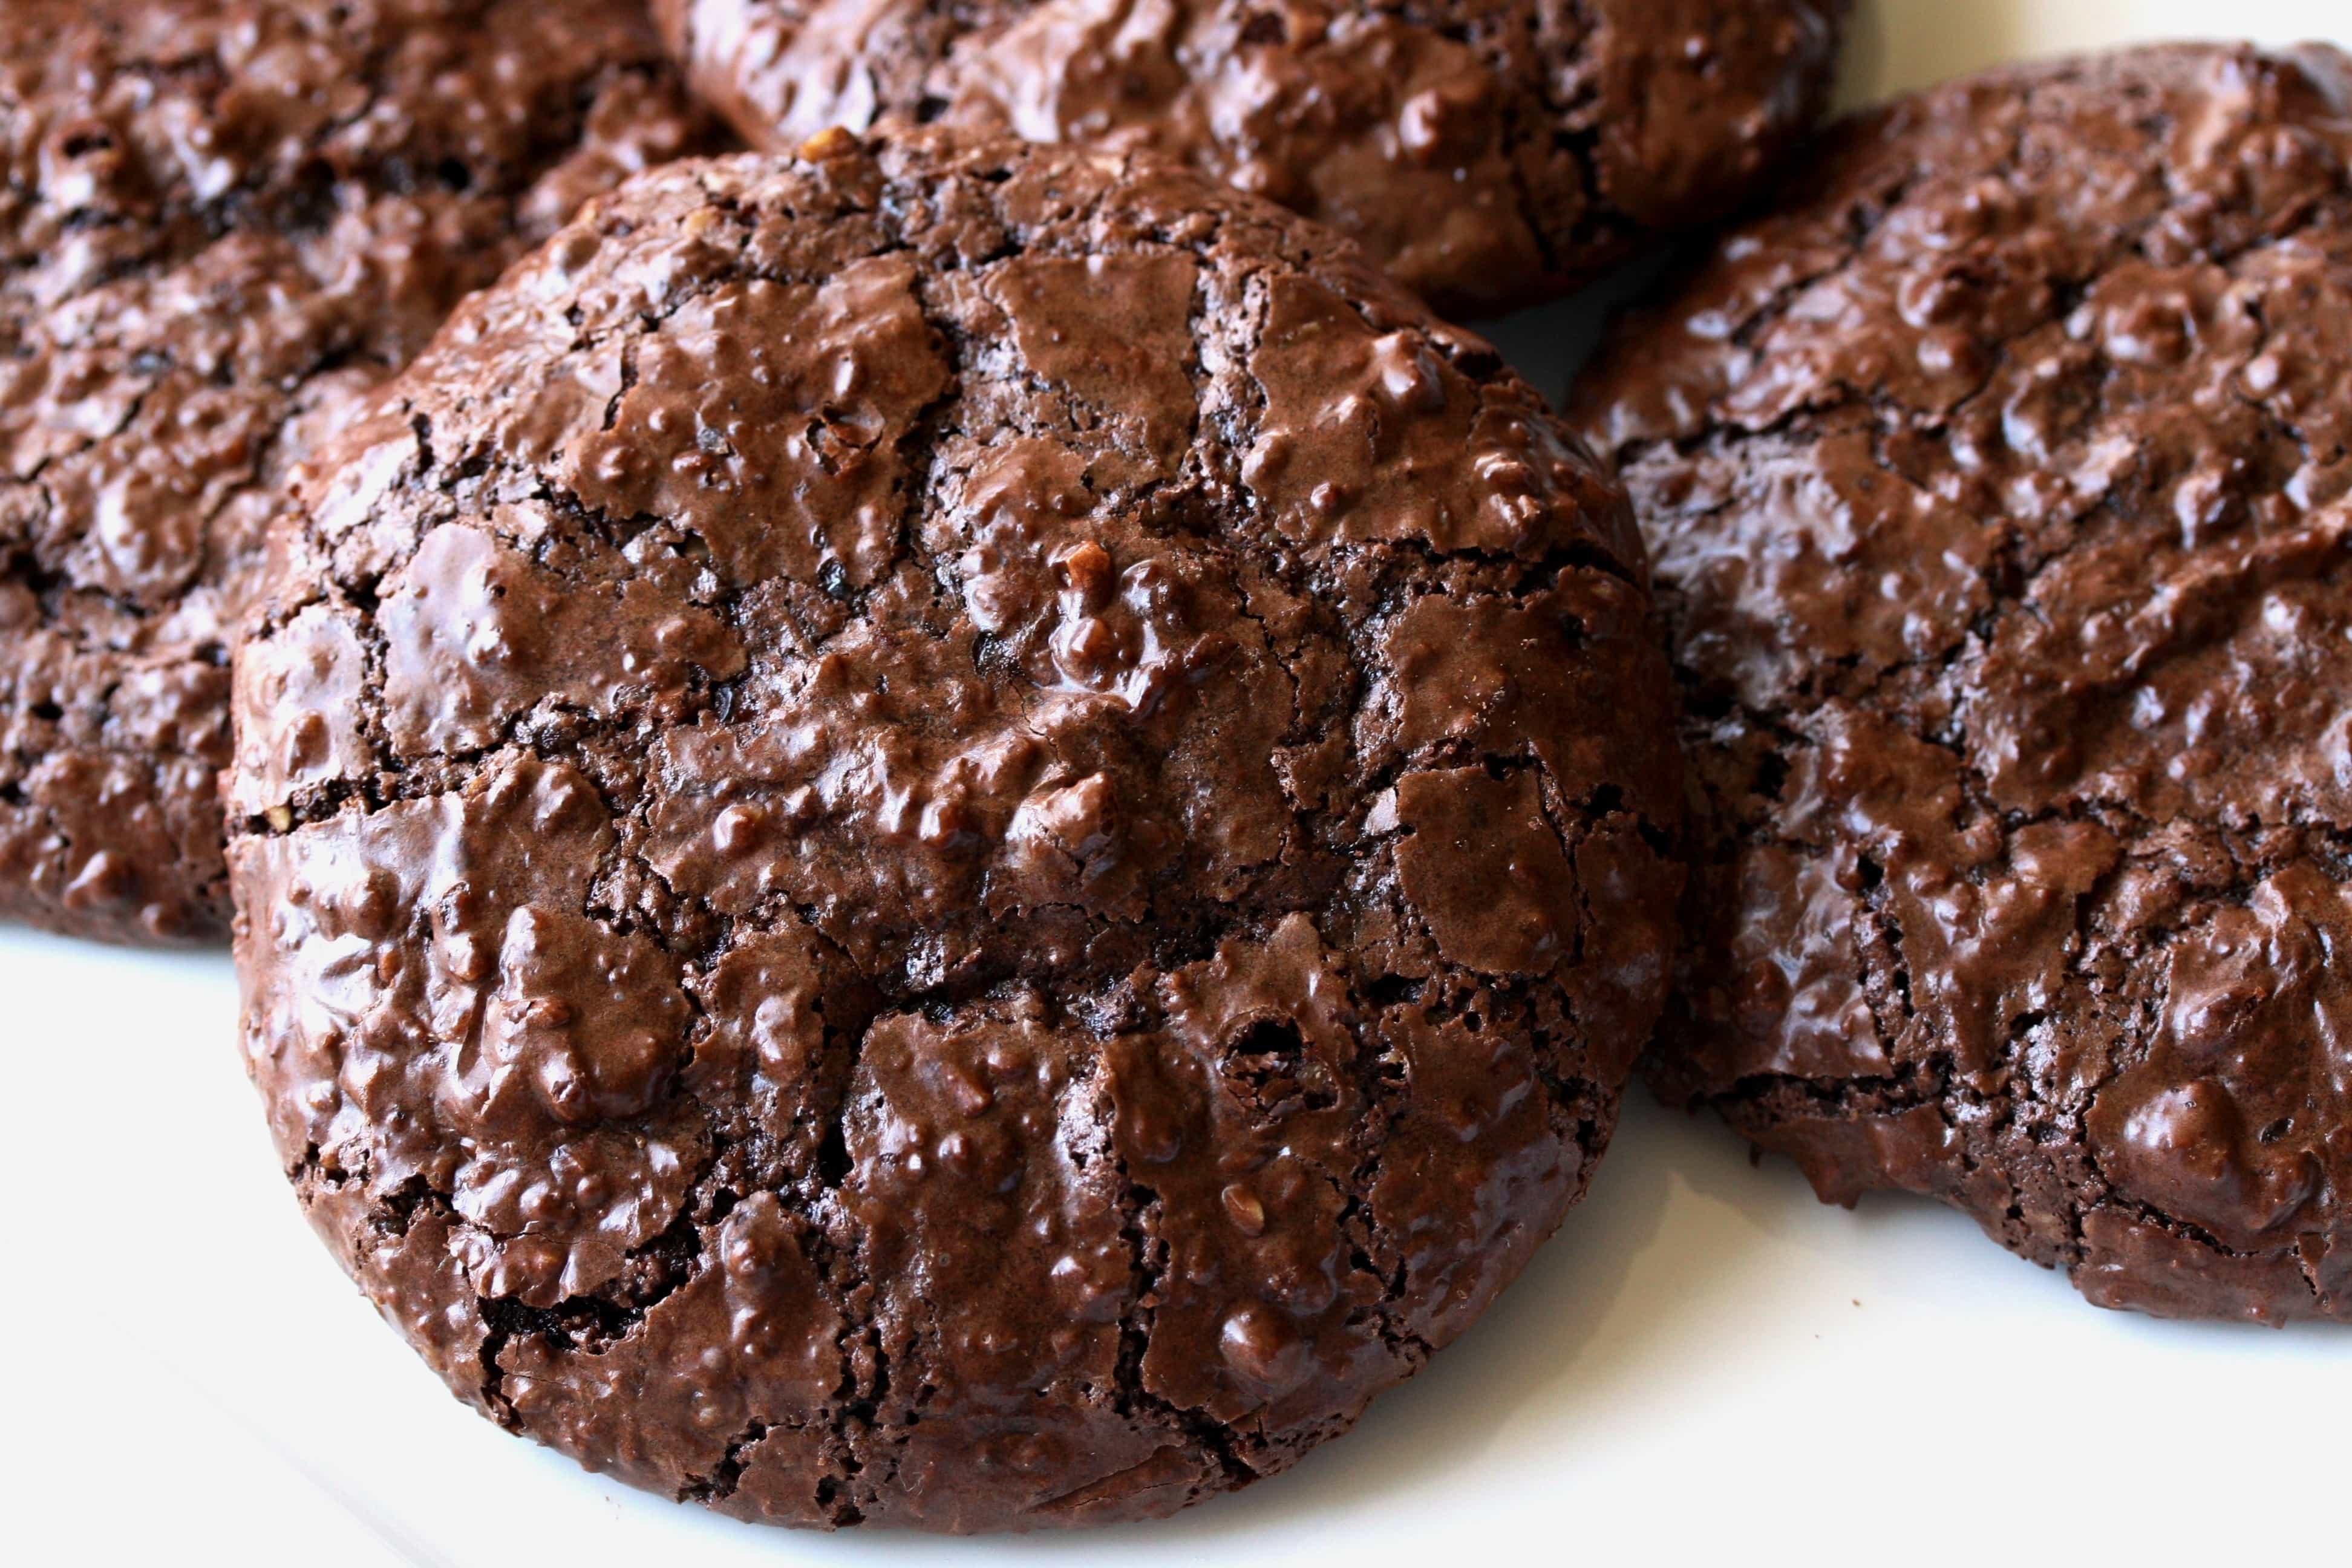 Chocolate Walnut Cookies  Chocolate Walnut Cookies Gluten Free Saving Room for